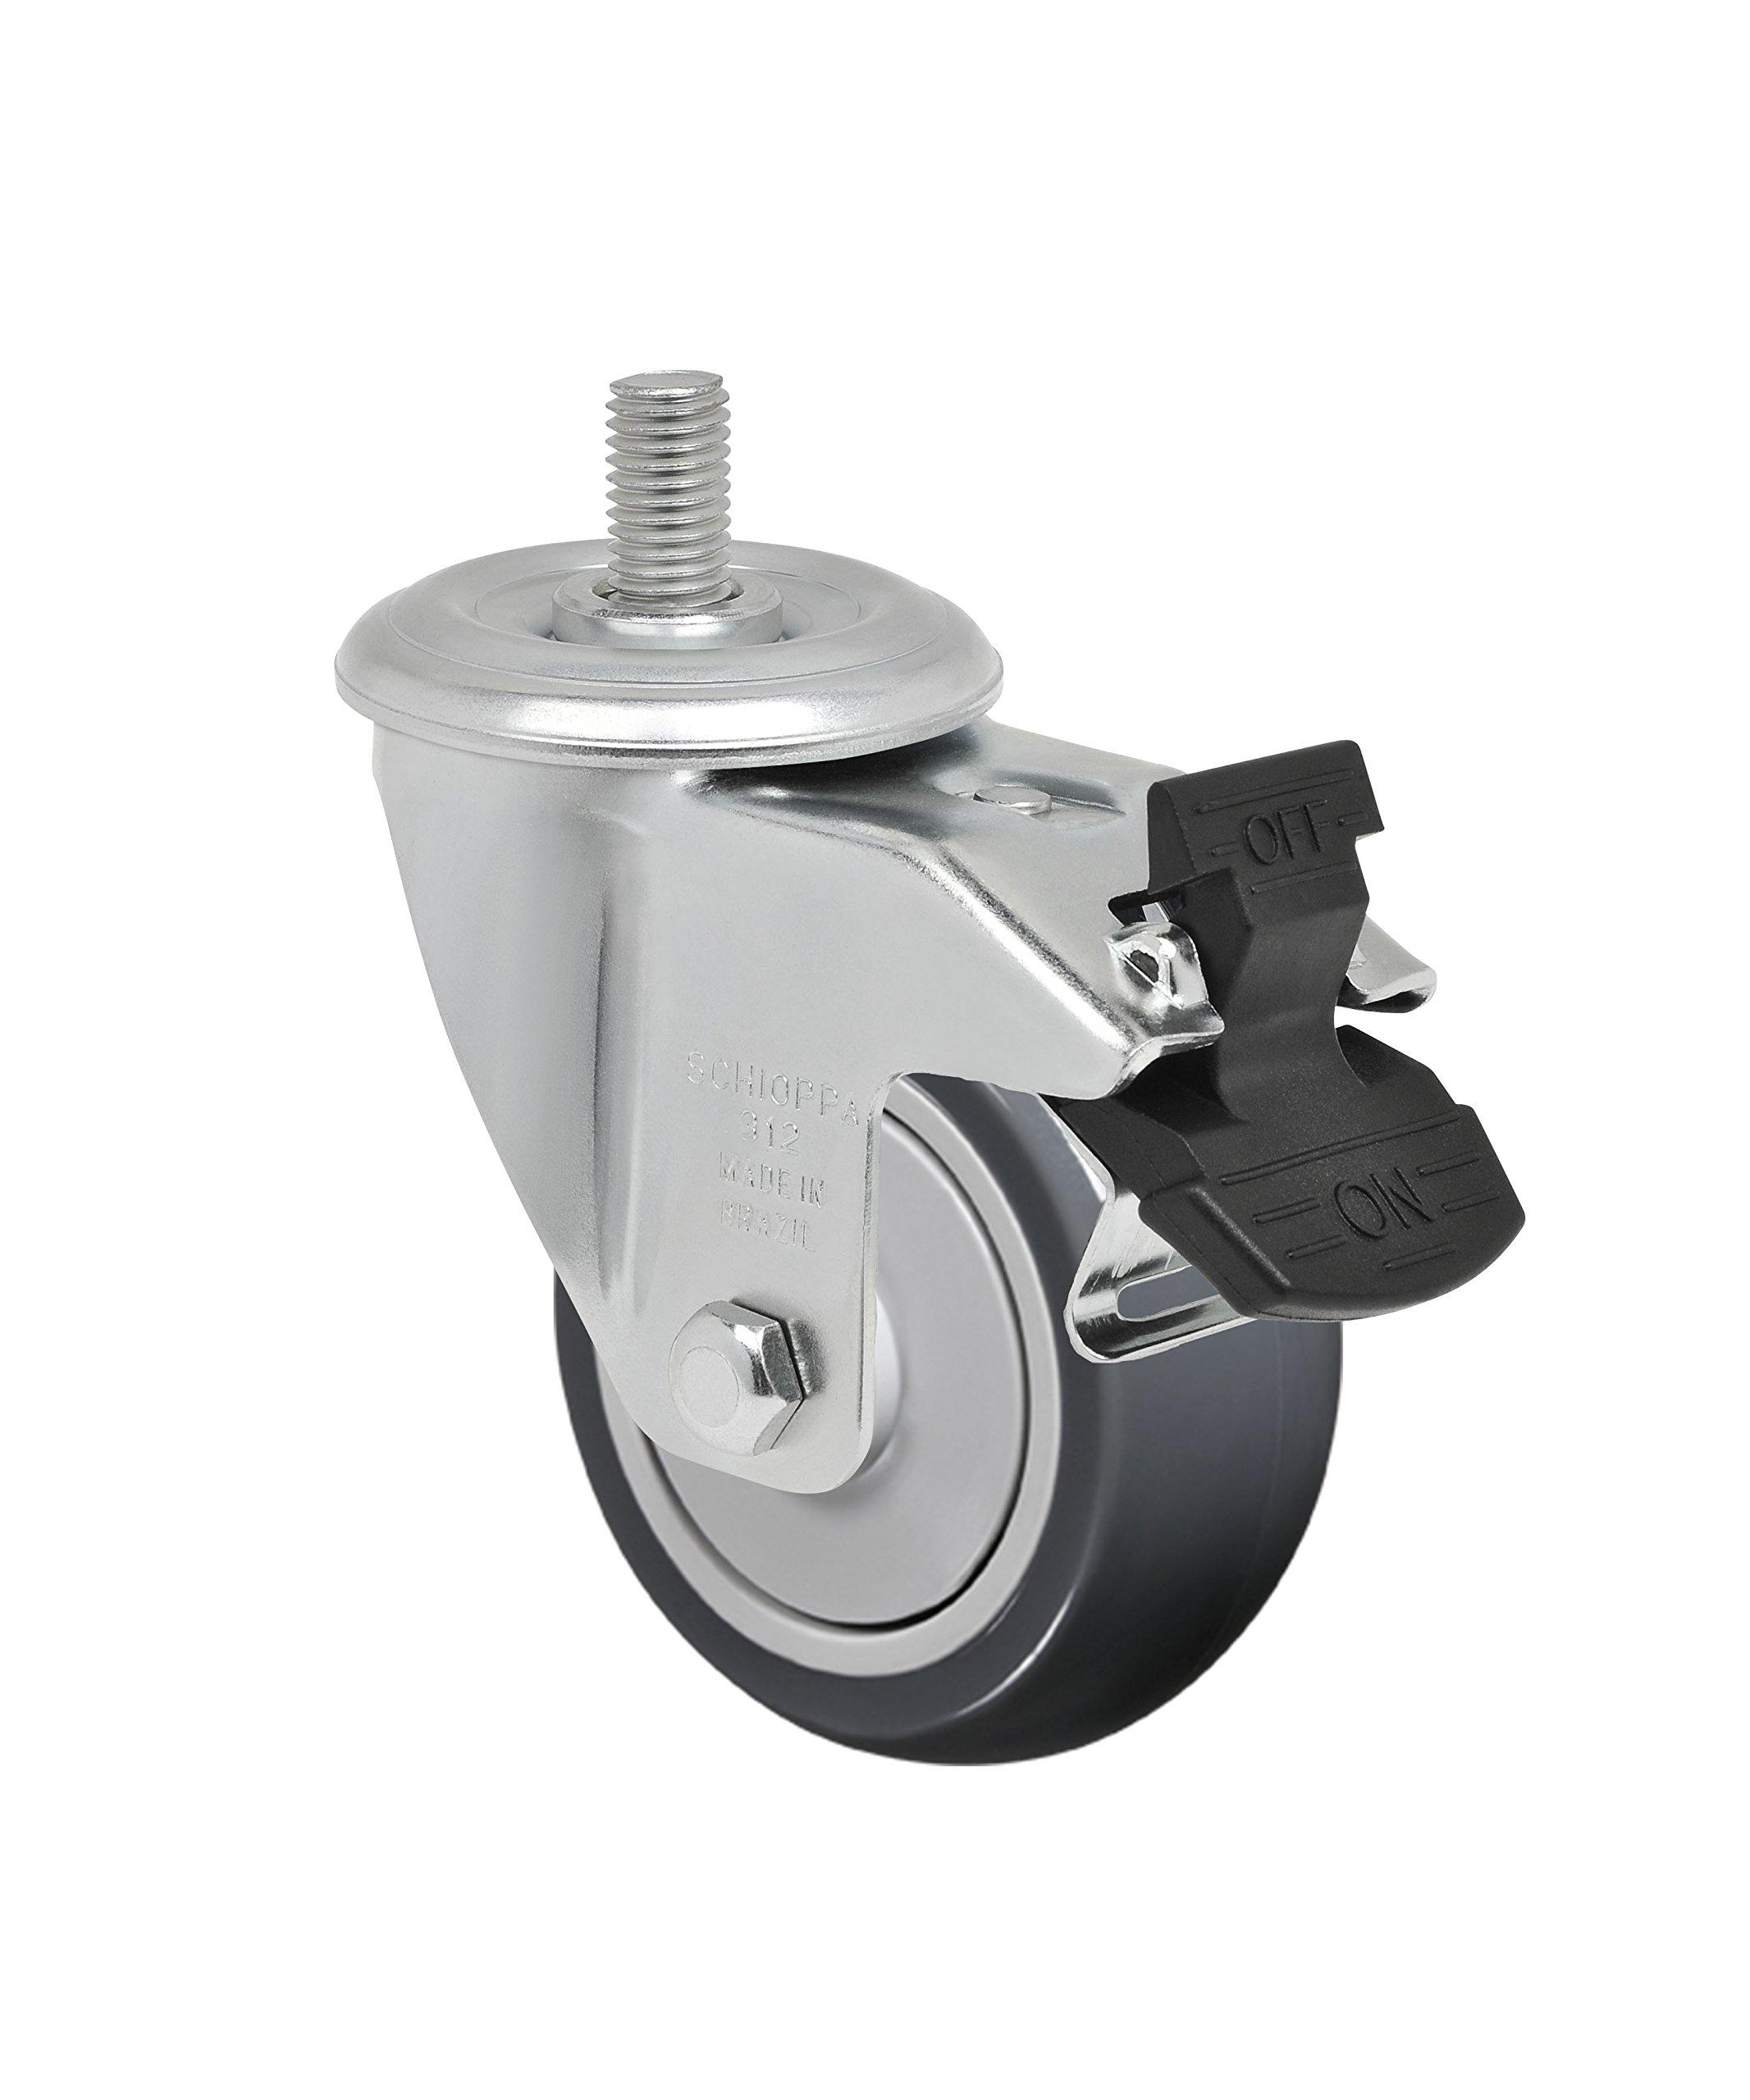 Schioppa L12 Series, GLEFD 312 TBE G, 3 x 1-1/4'' Swivel Caster with Total Lock Brake, Non-Marking Thermoplastic Rubber Precision Ball Bearing Wheel, 150 lbs, 10 mm Diameter x 25 mm Length Threaded Stem